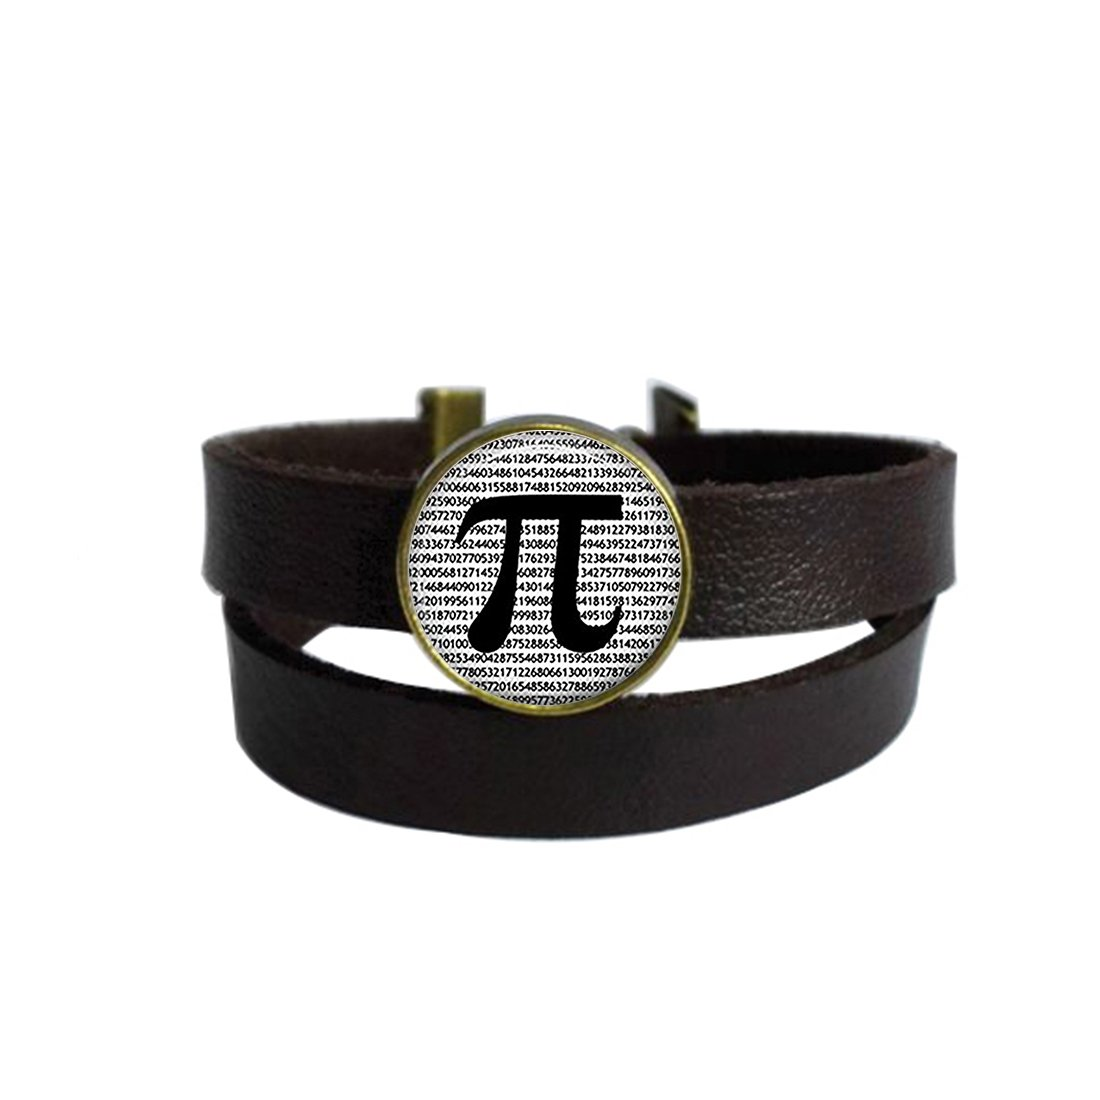 LooPoP Vintage Punk Dark Brown Leather Bracelet Math Teachers Science Mathematics Belt Wrap Cuff Bangle Adjustable